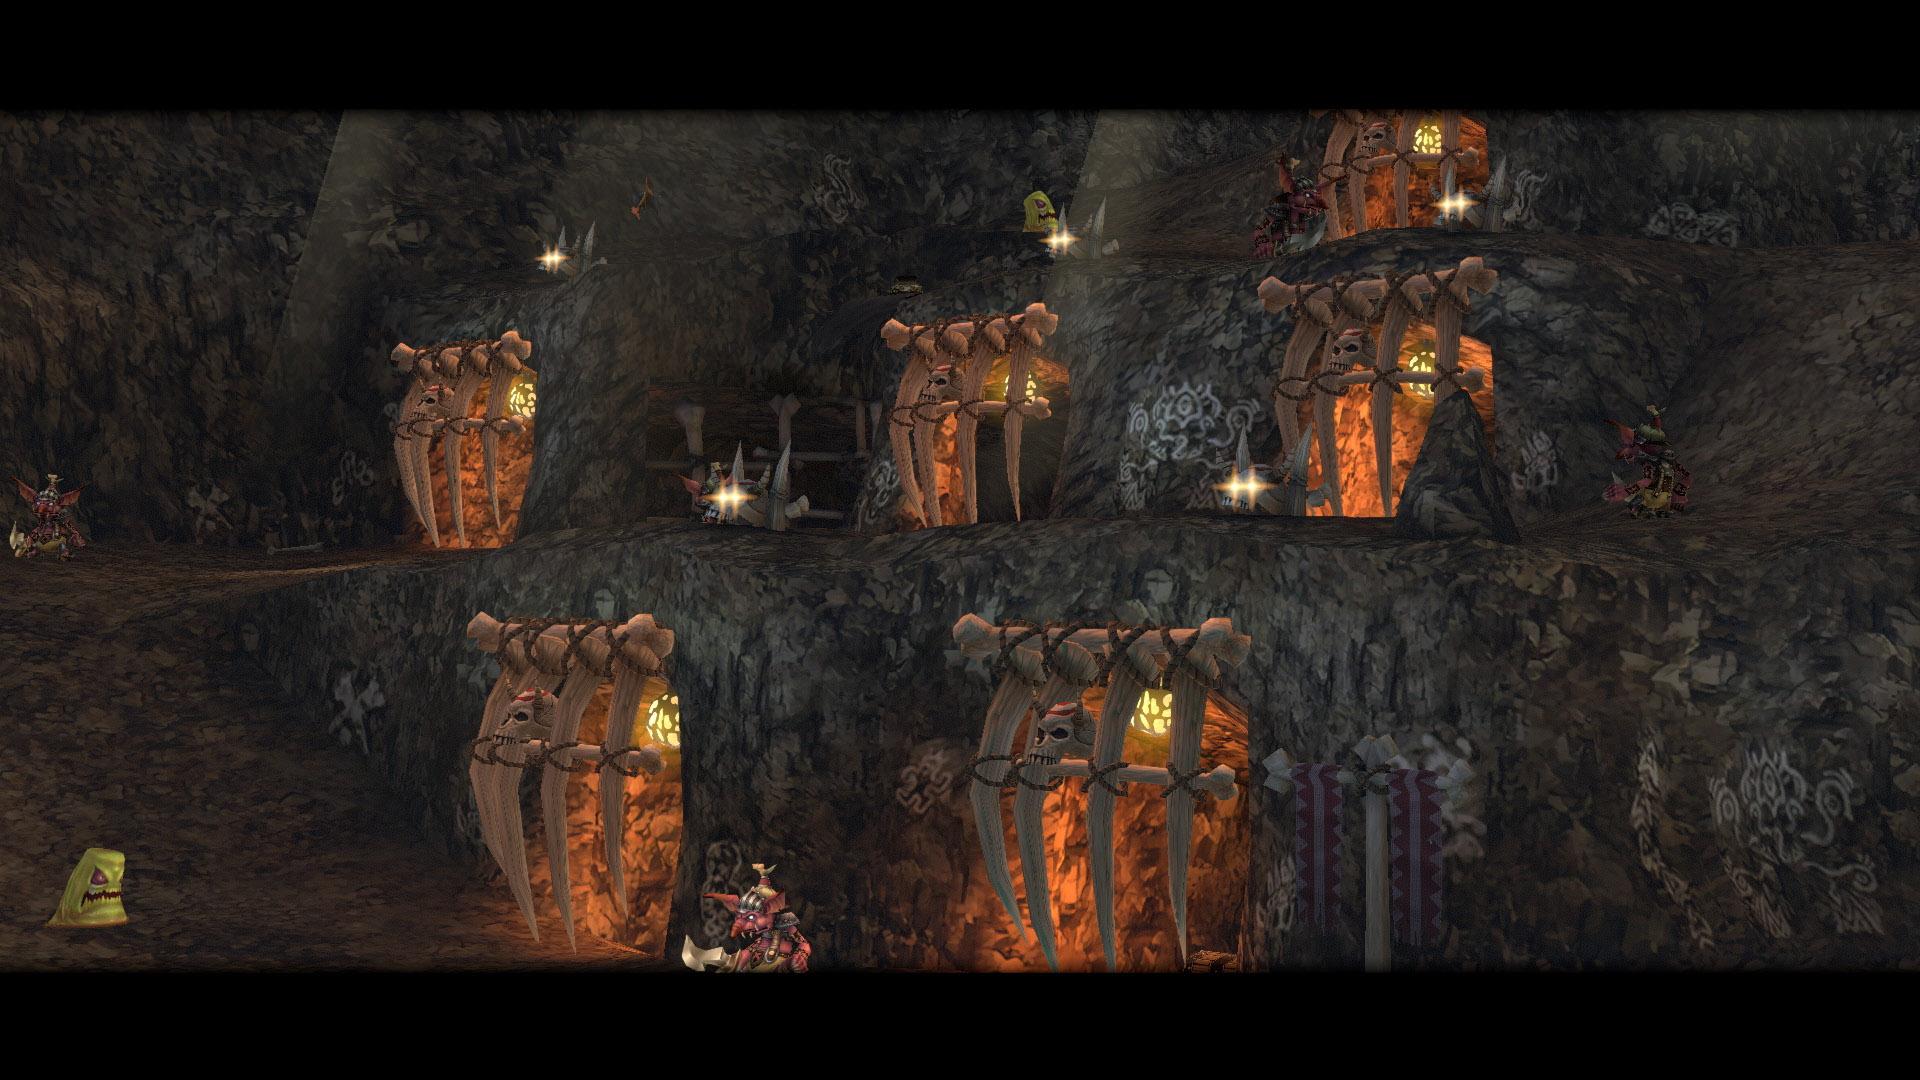 final fantasy crystal chronicles demo (10)